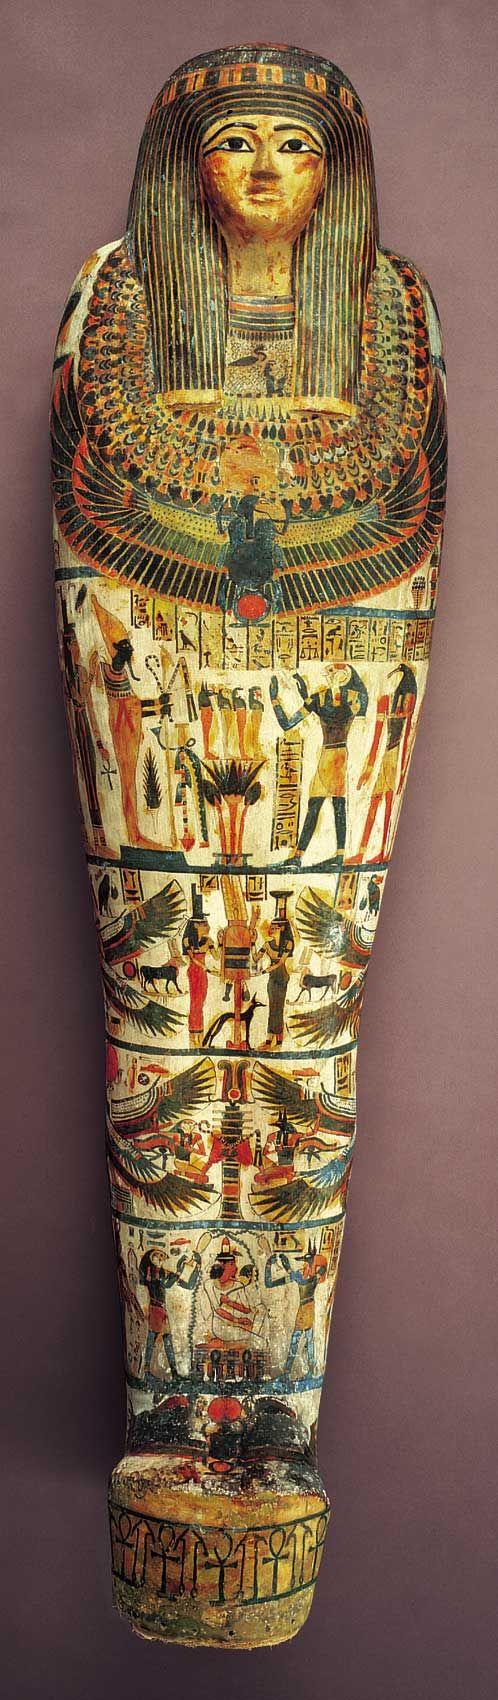 Mummy Case of Amen-Nestawy-Nakht c.900 B.C., Egyptian, Dynasty 22 linen, plaster, and pigment. Saint Louis Art Museum